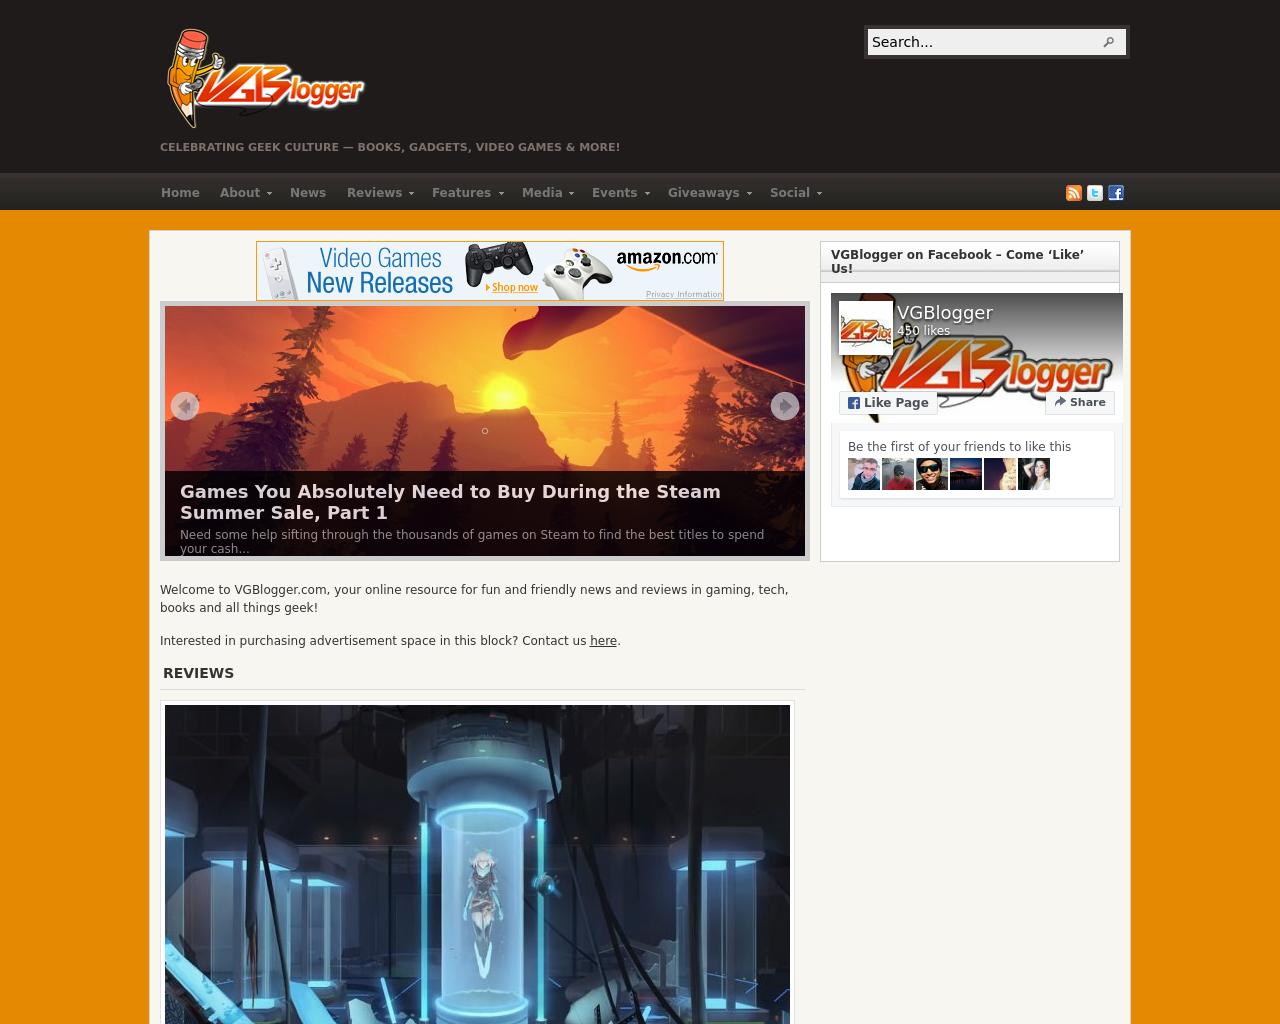 VGBlogger-Advertising-Reviews-Pricing